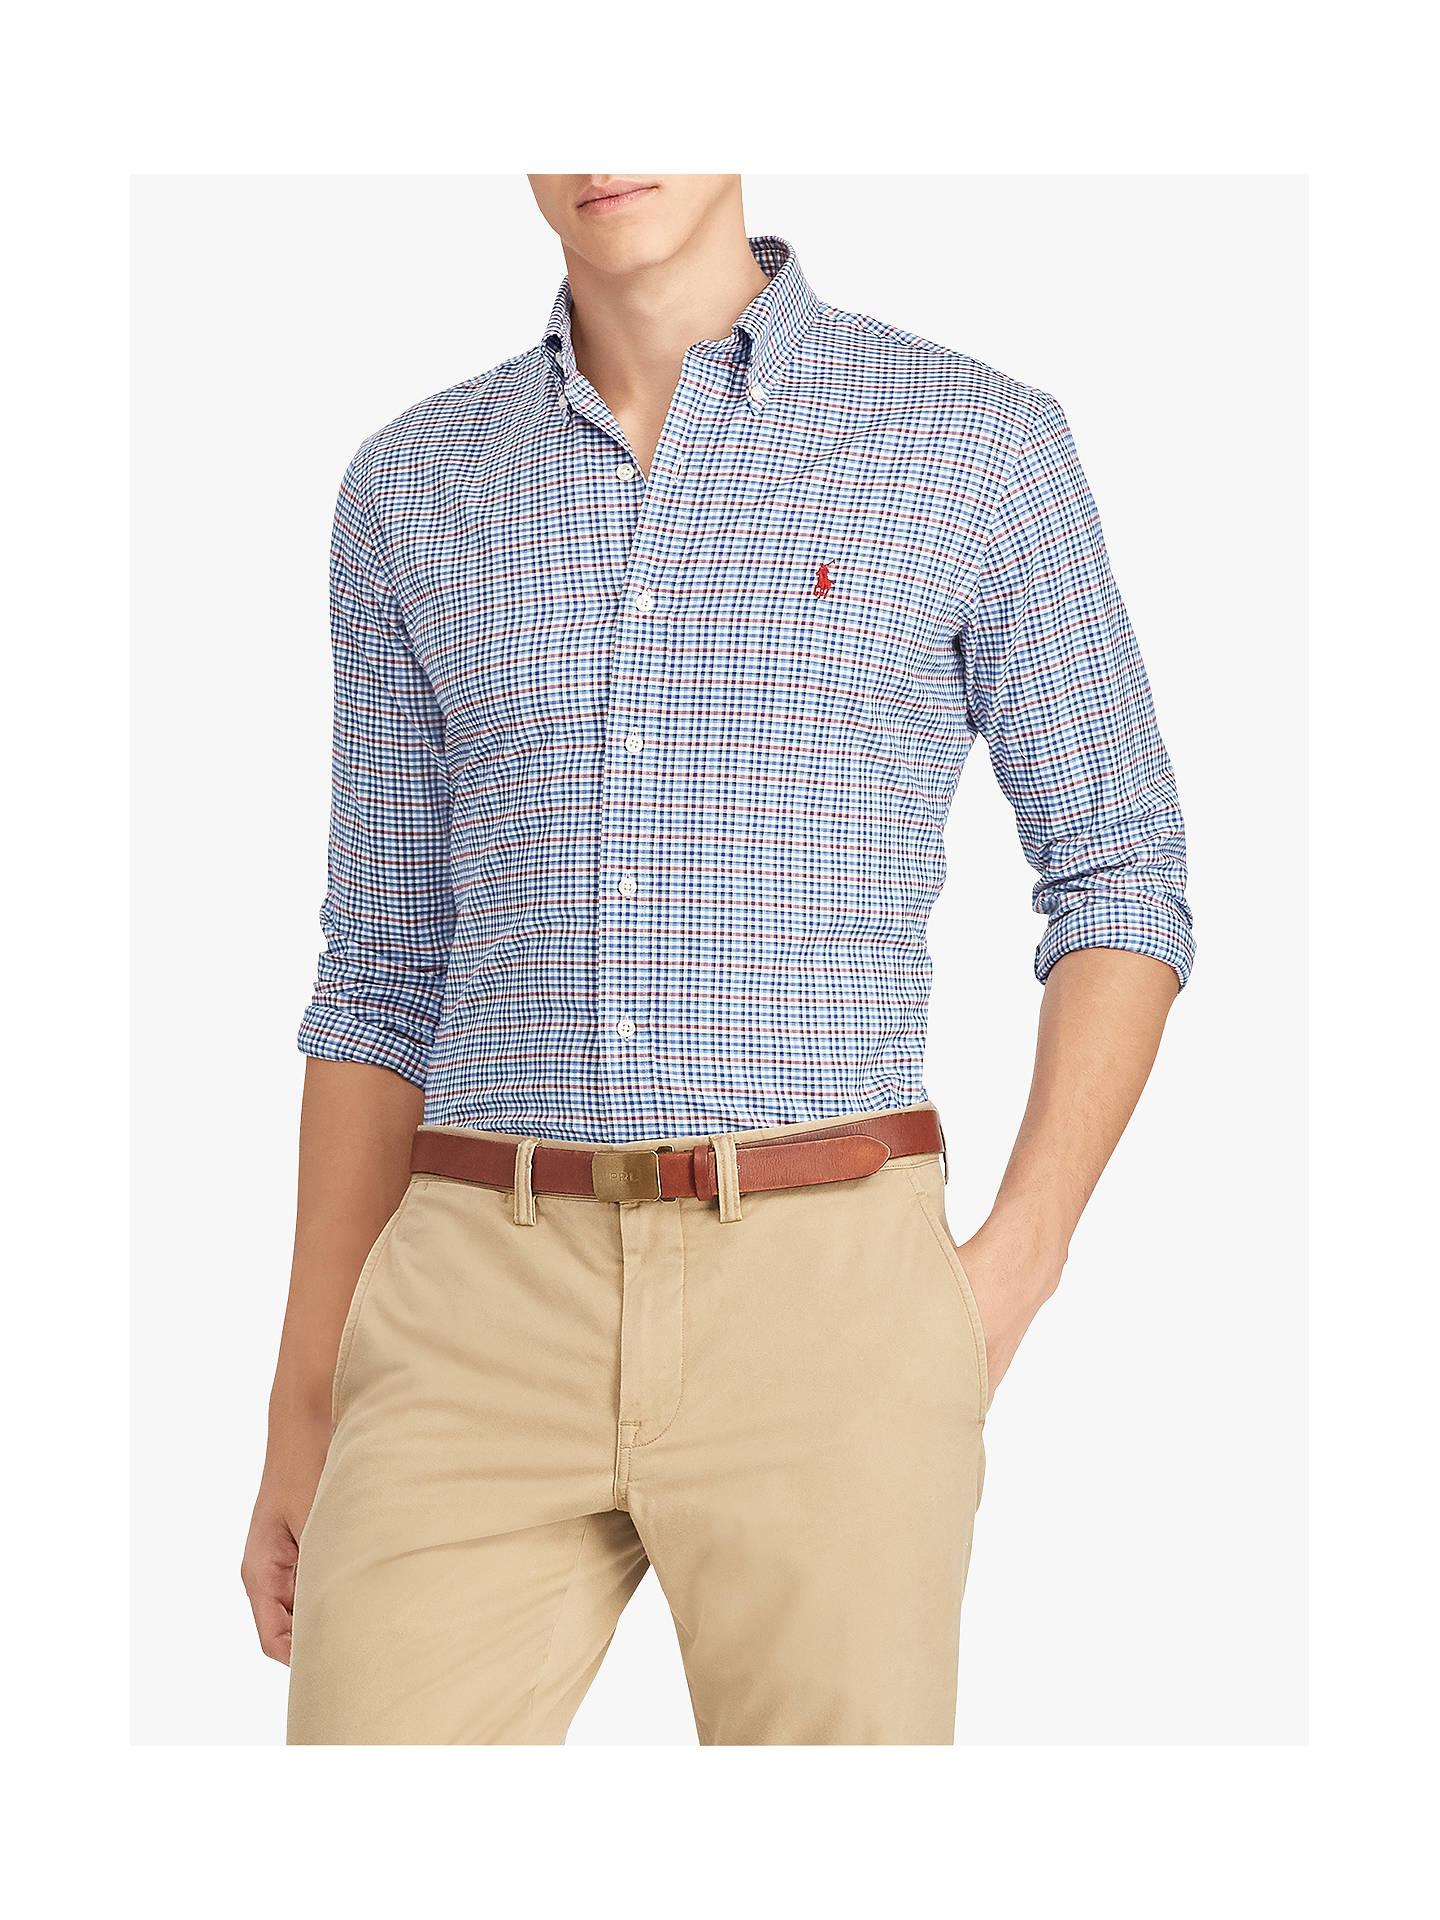 f3ea425c81ab Buy Polo Ralph Lauren Long Sleeve Sport Check Shirt, Cadet Blue/White, L ...